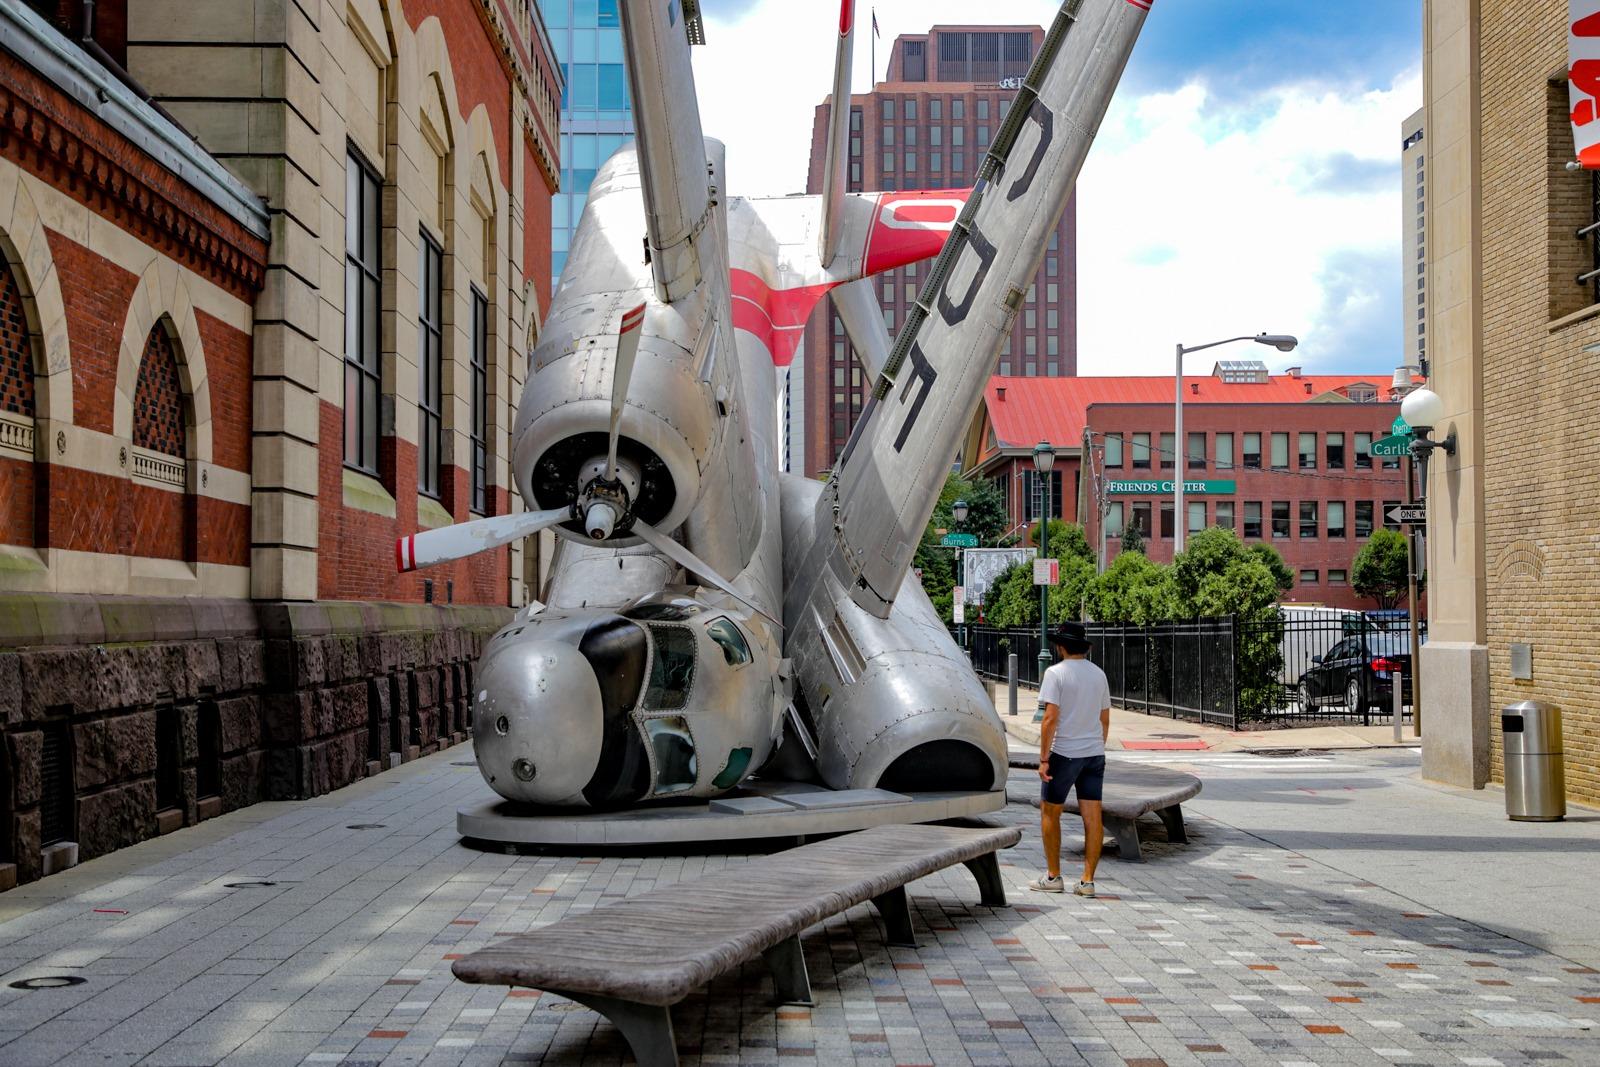 V File ocenʹ mnogo iskusstva. Ot muzeev s kollekciami mirovogo urovna, do takih ulicnyh art-obʺektov.